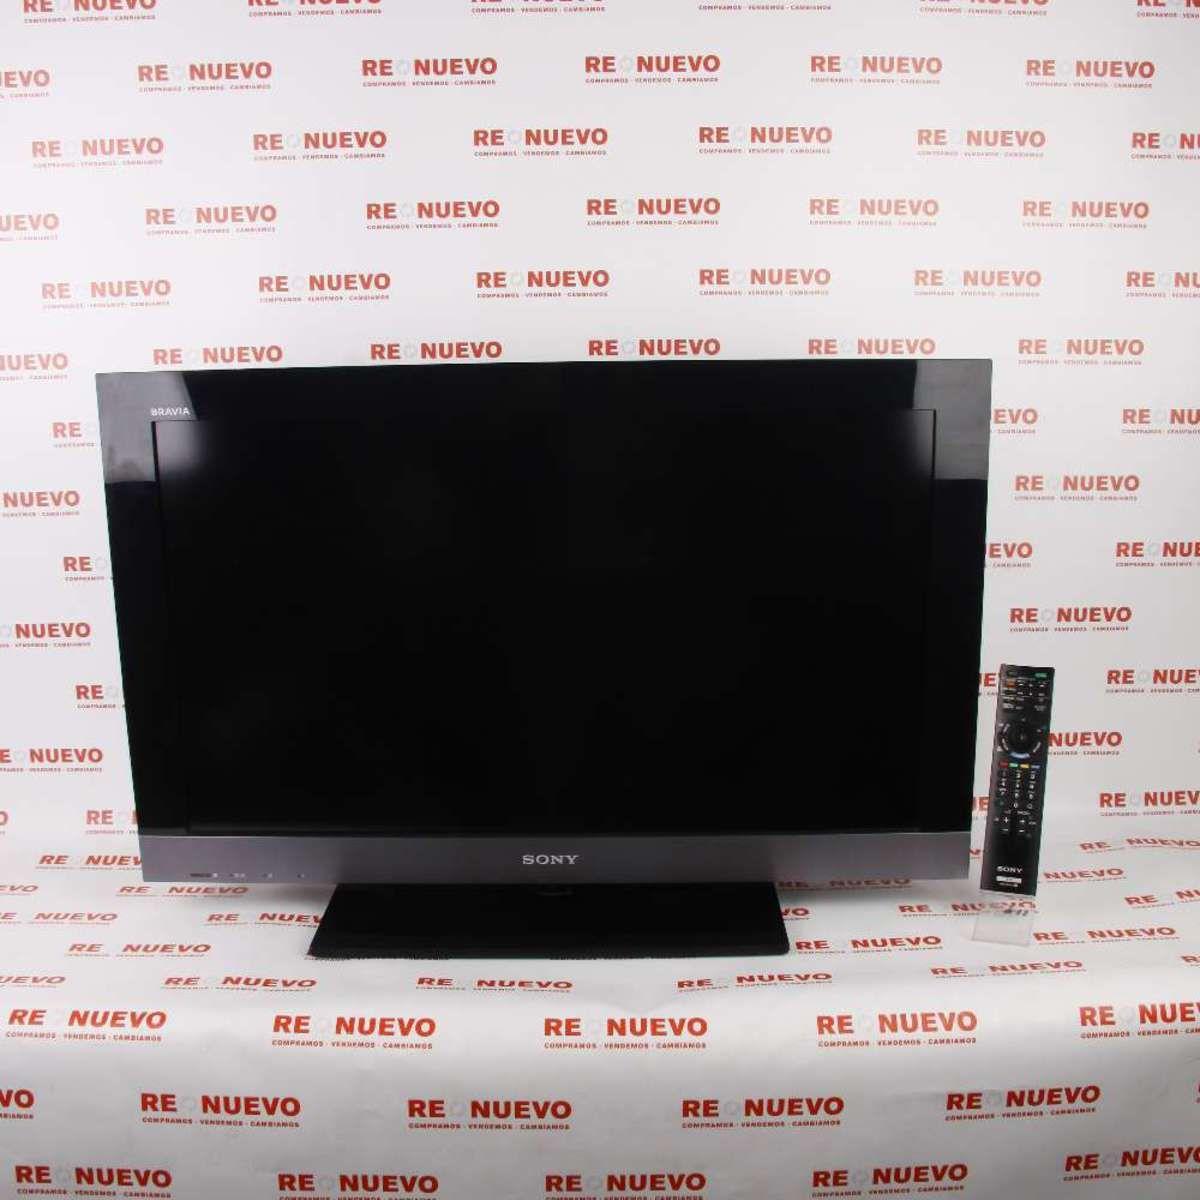 "Televisor de 32'' SONY BRAVIA EX500 E268191 #Televisión 32"" # de segunda mano # SONY"